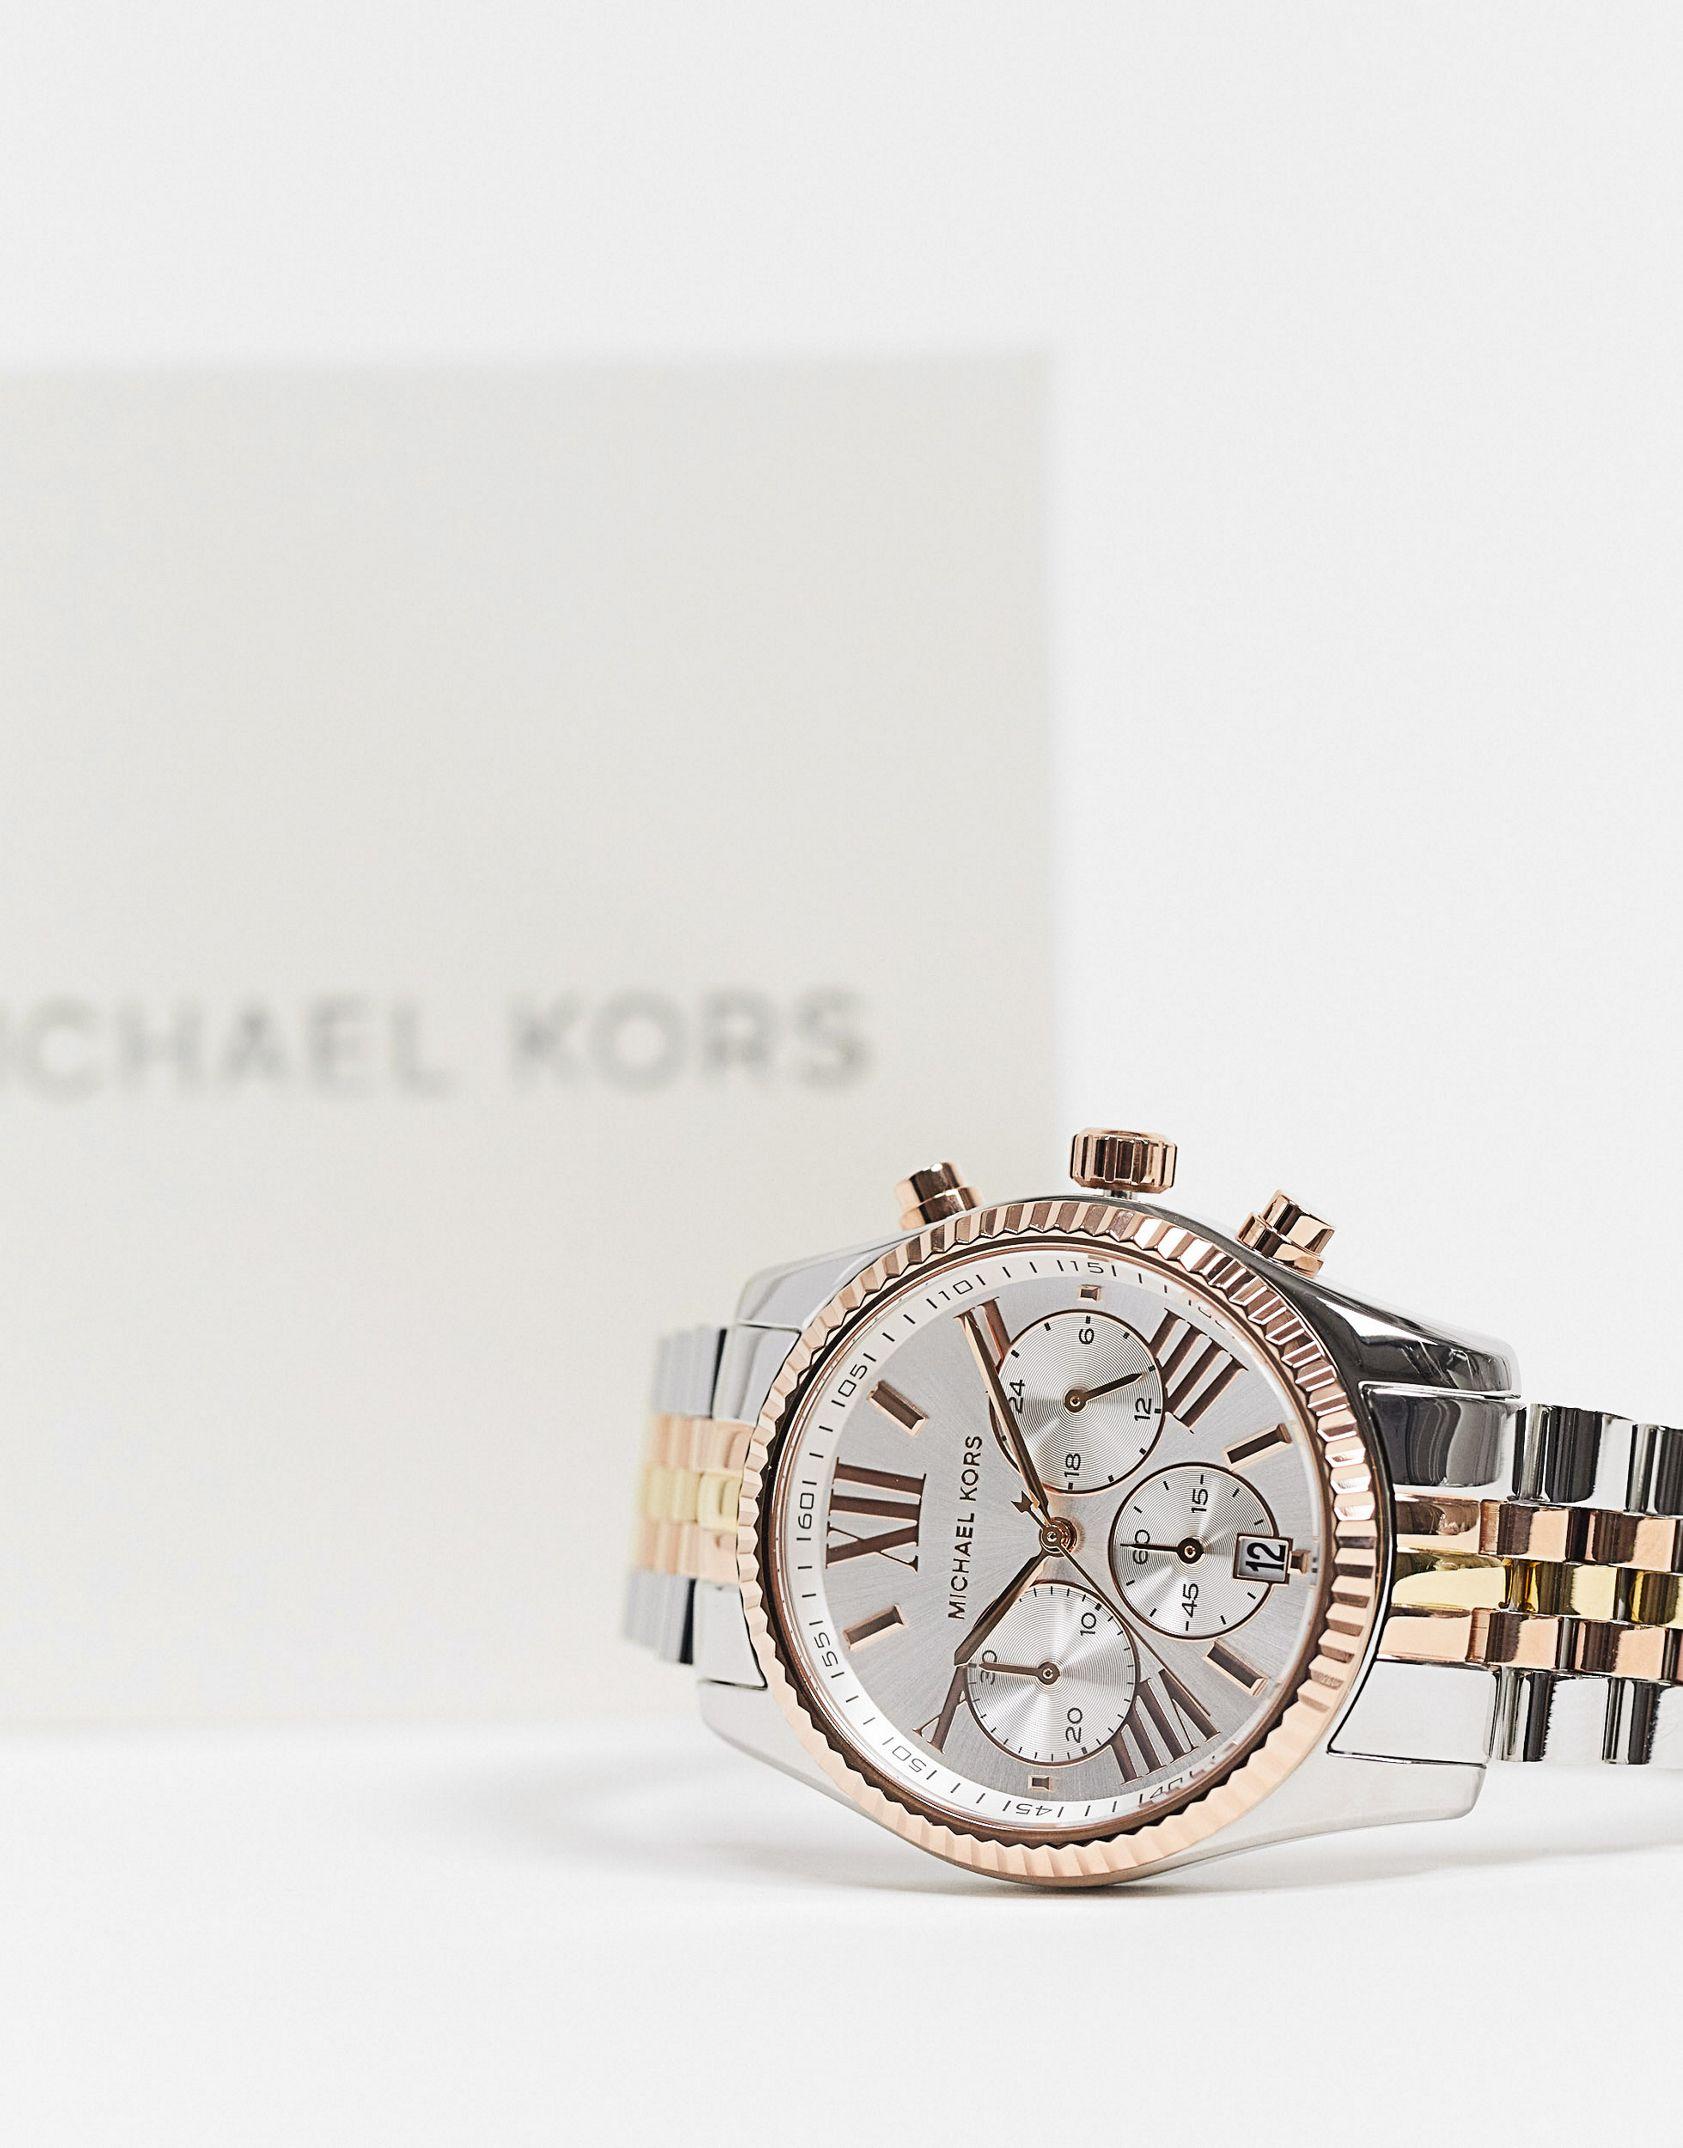 Michael Kors MK5735 Lexington bracelet watch in mixed metal -  Price Checker